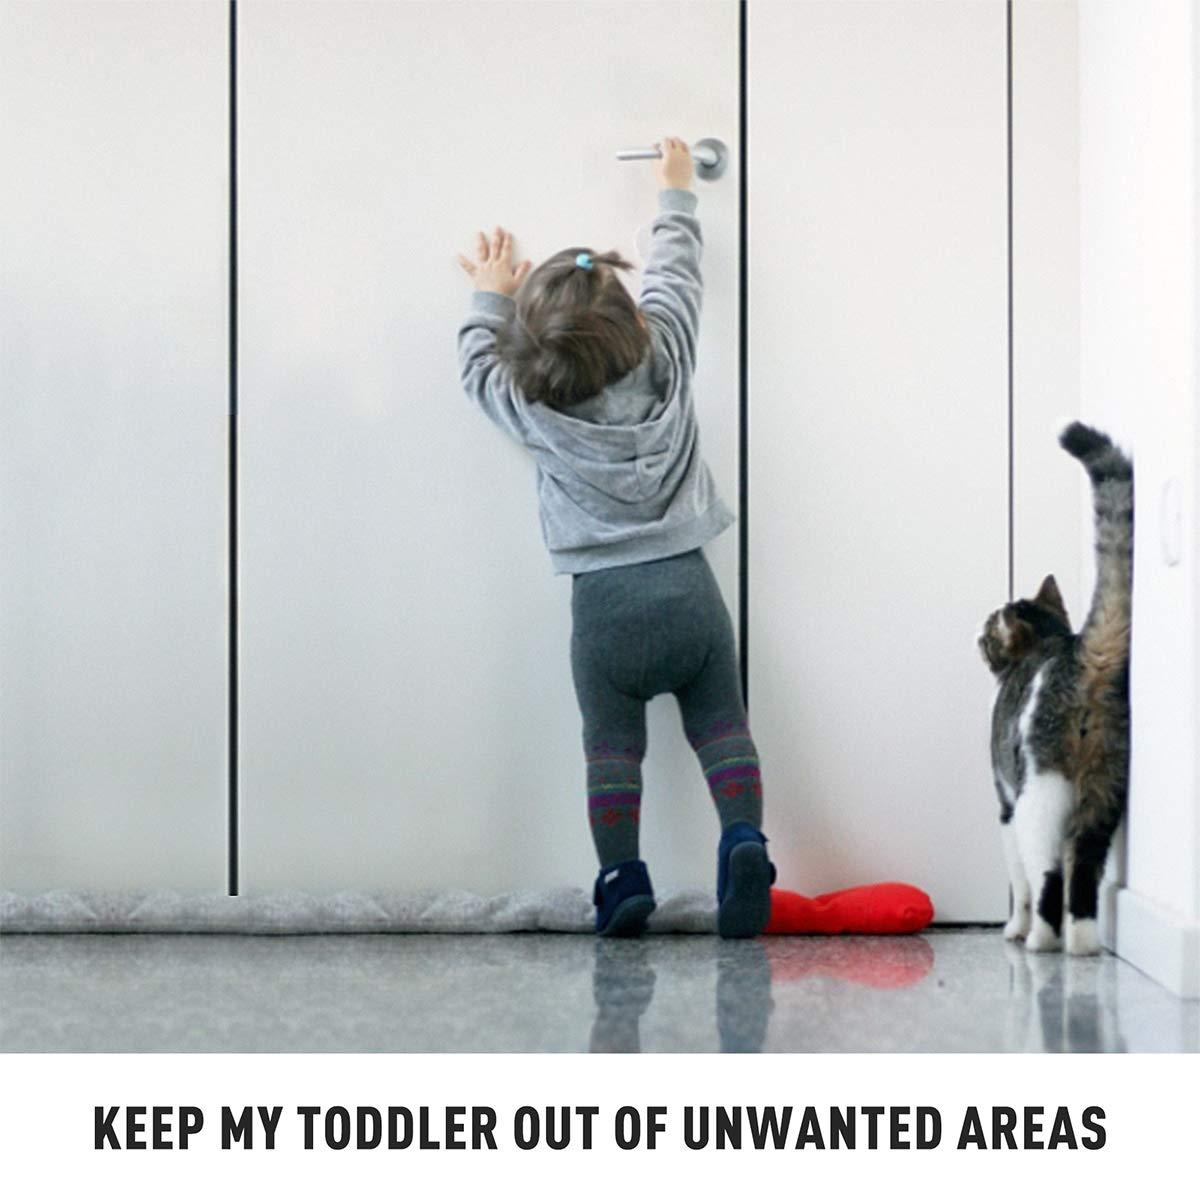 Door Lever Locks White WeGuard 2 Pack No Drill Child Proof Door Handle Locks Adhesive Baby//Pet Safety Proof Locks One Hand Operation